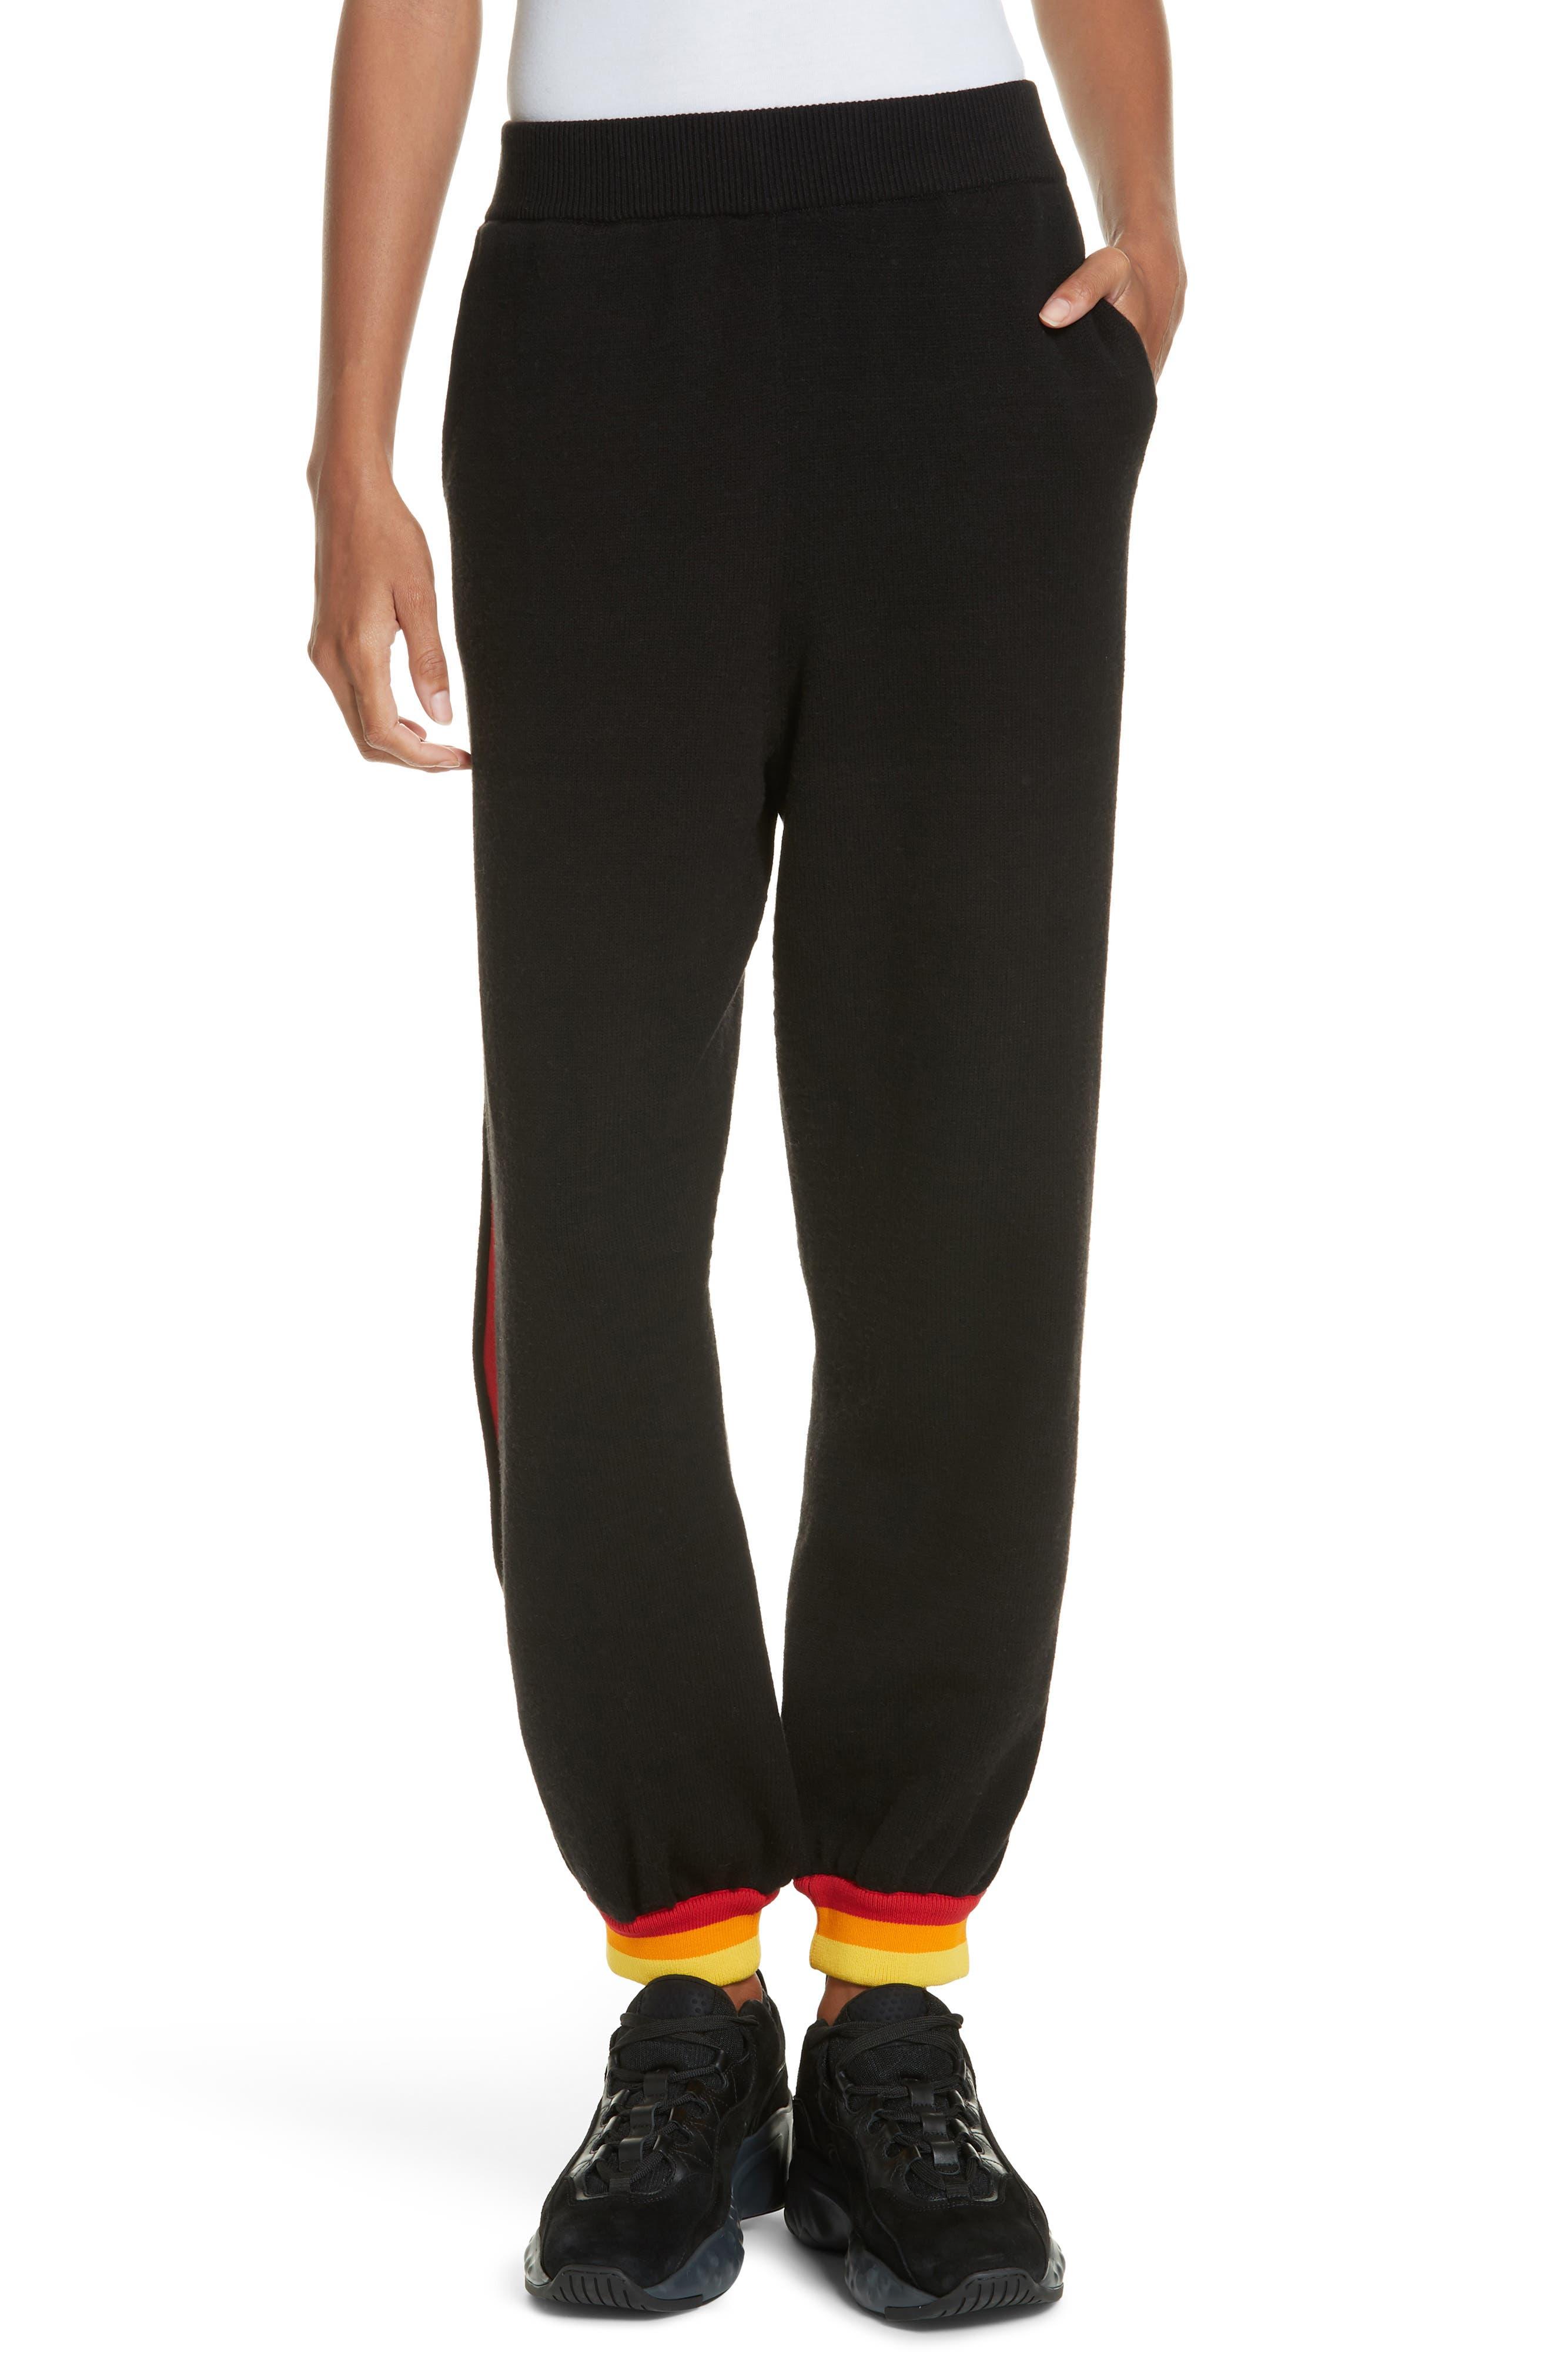 OPENING CEREMONY,                             Unisex Jogger Pants,                             Main thumbnail 1, color,                             BLACK MULTI